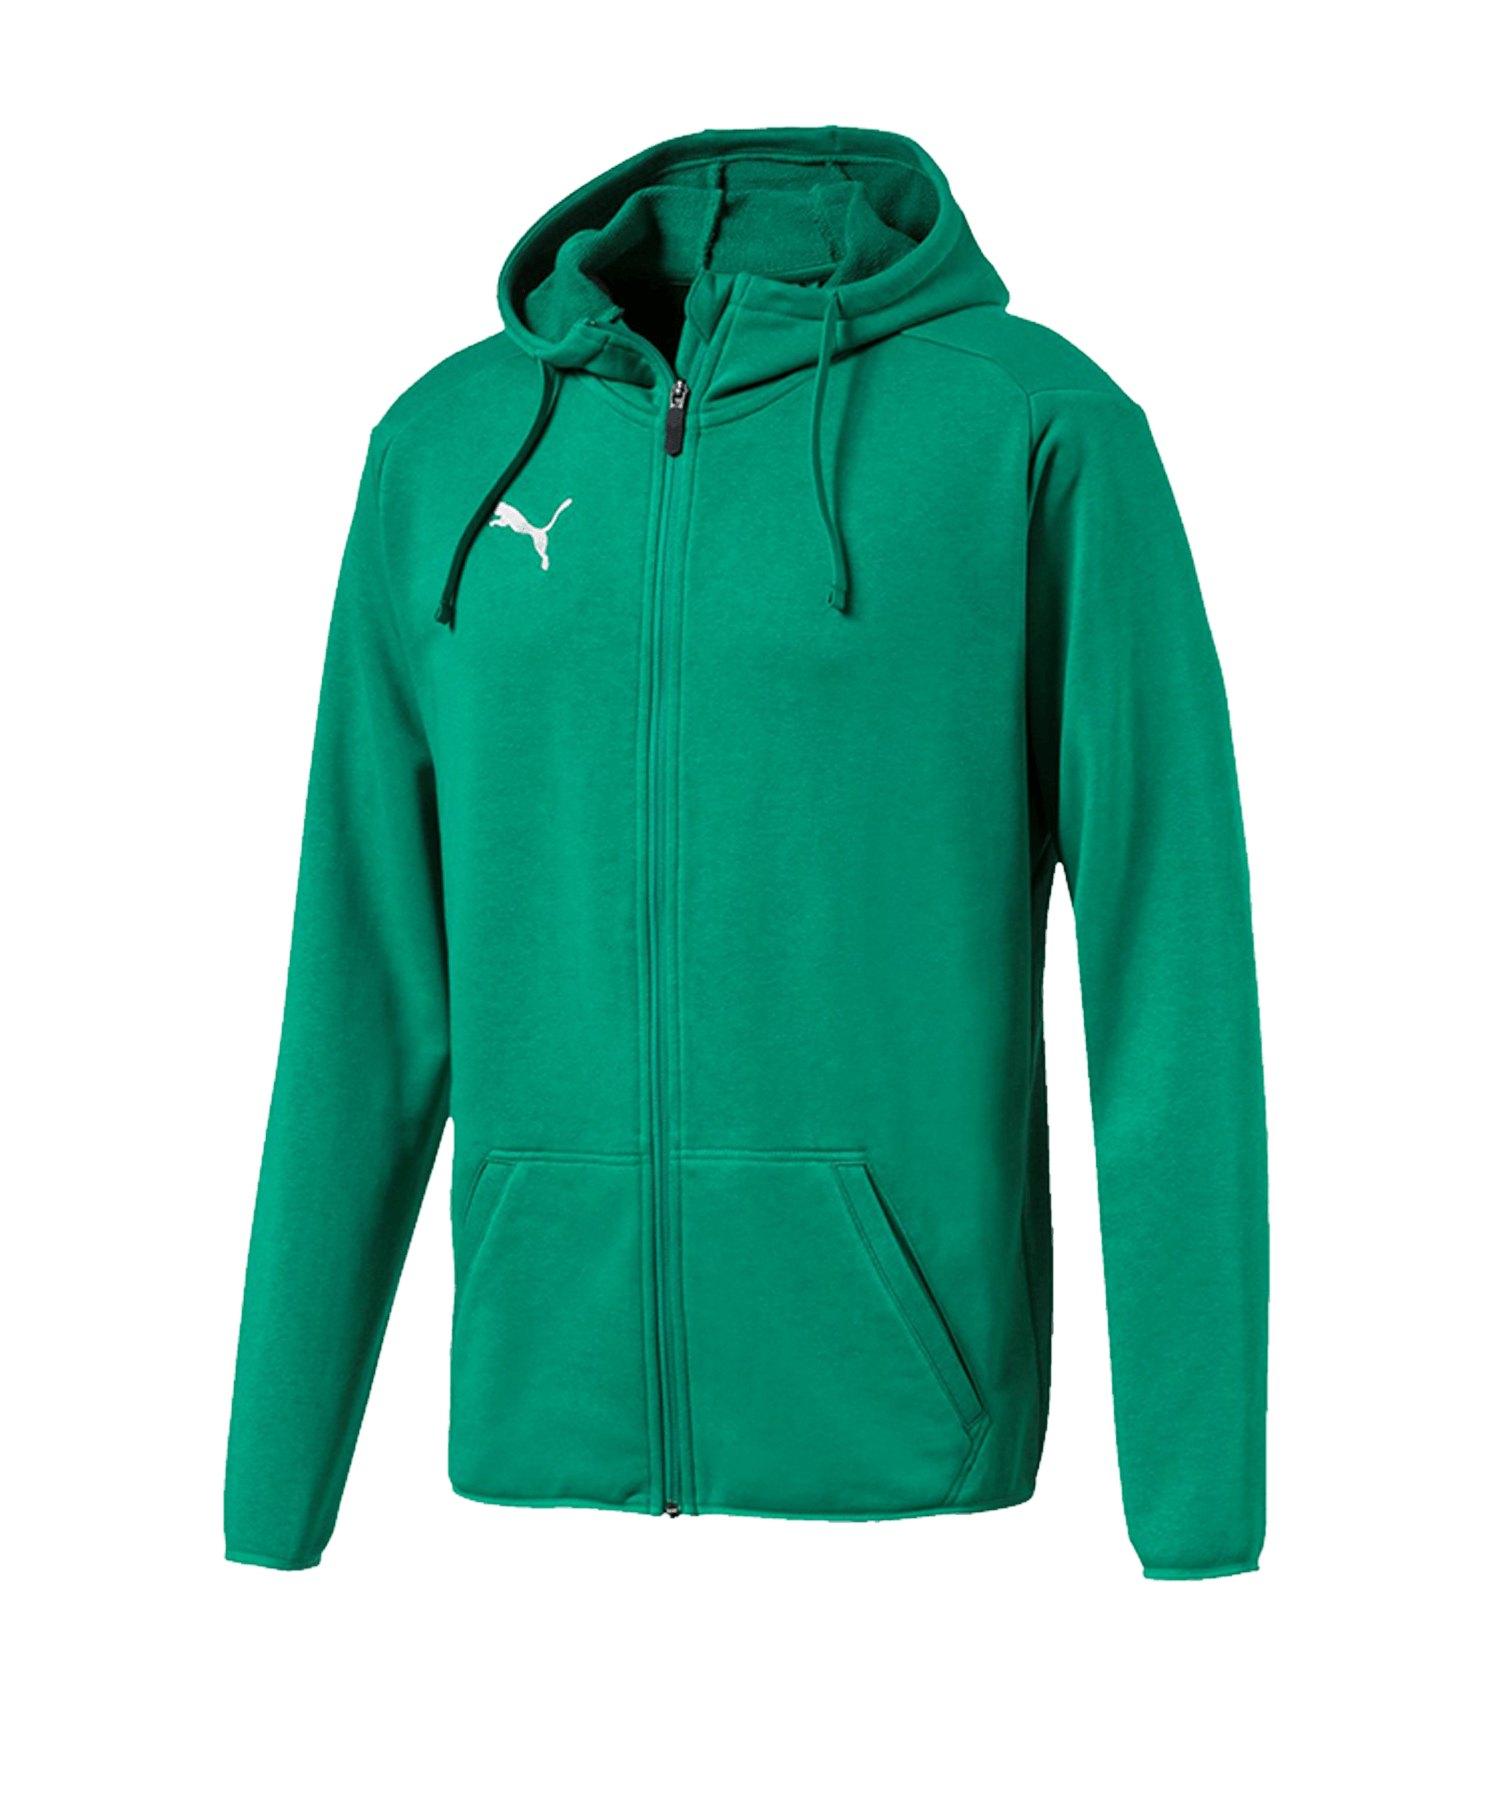 PUMA LIGA Casual Jacket Jacke Grün F05 - gruen